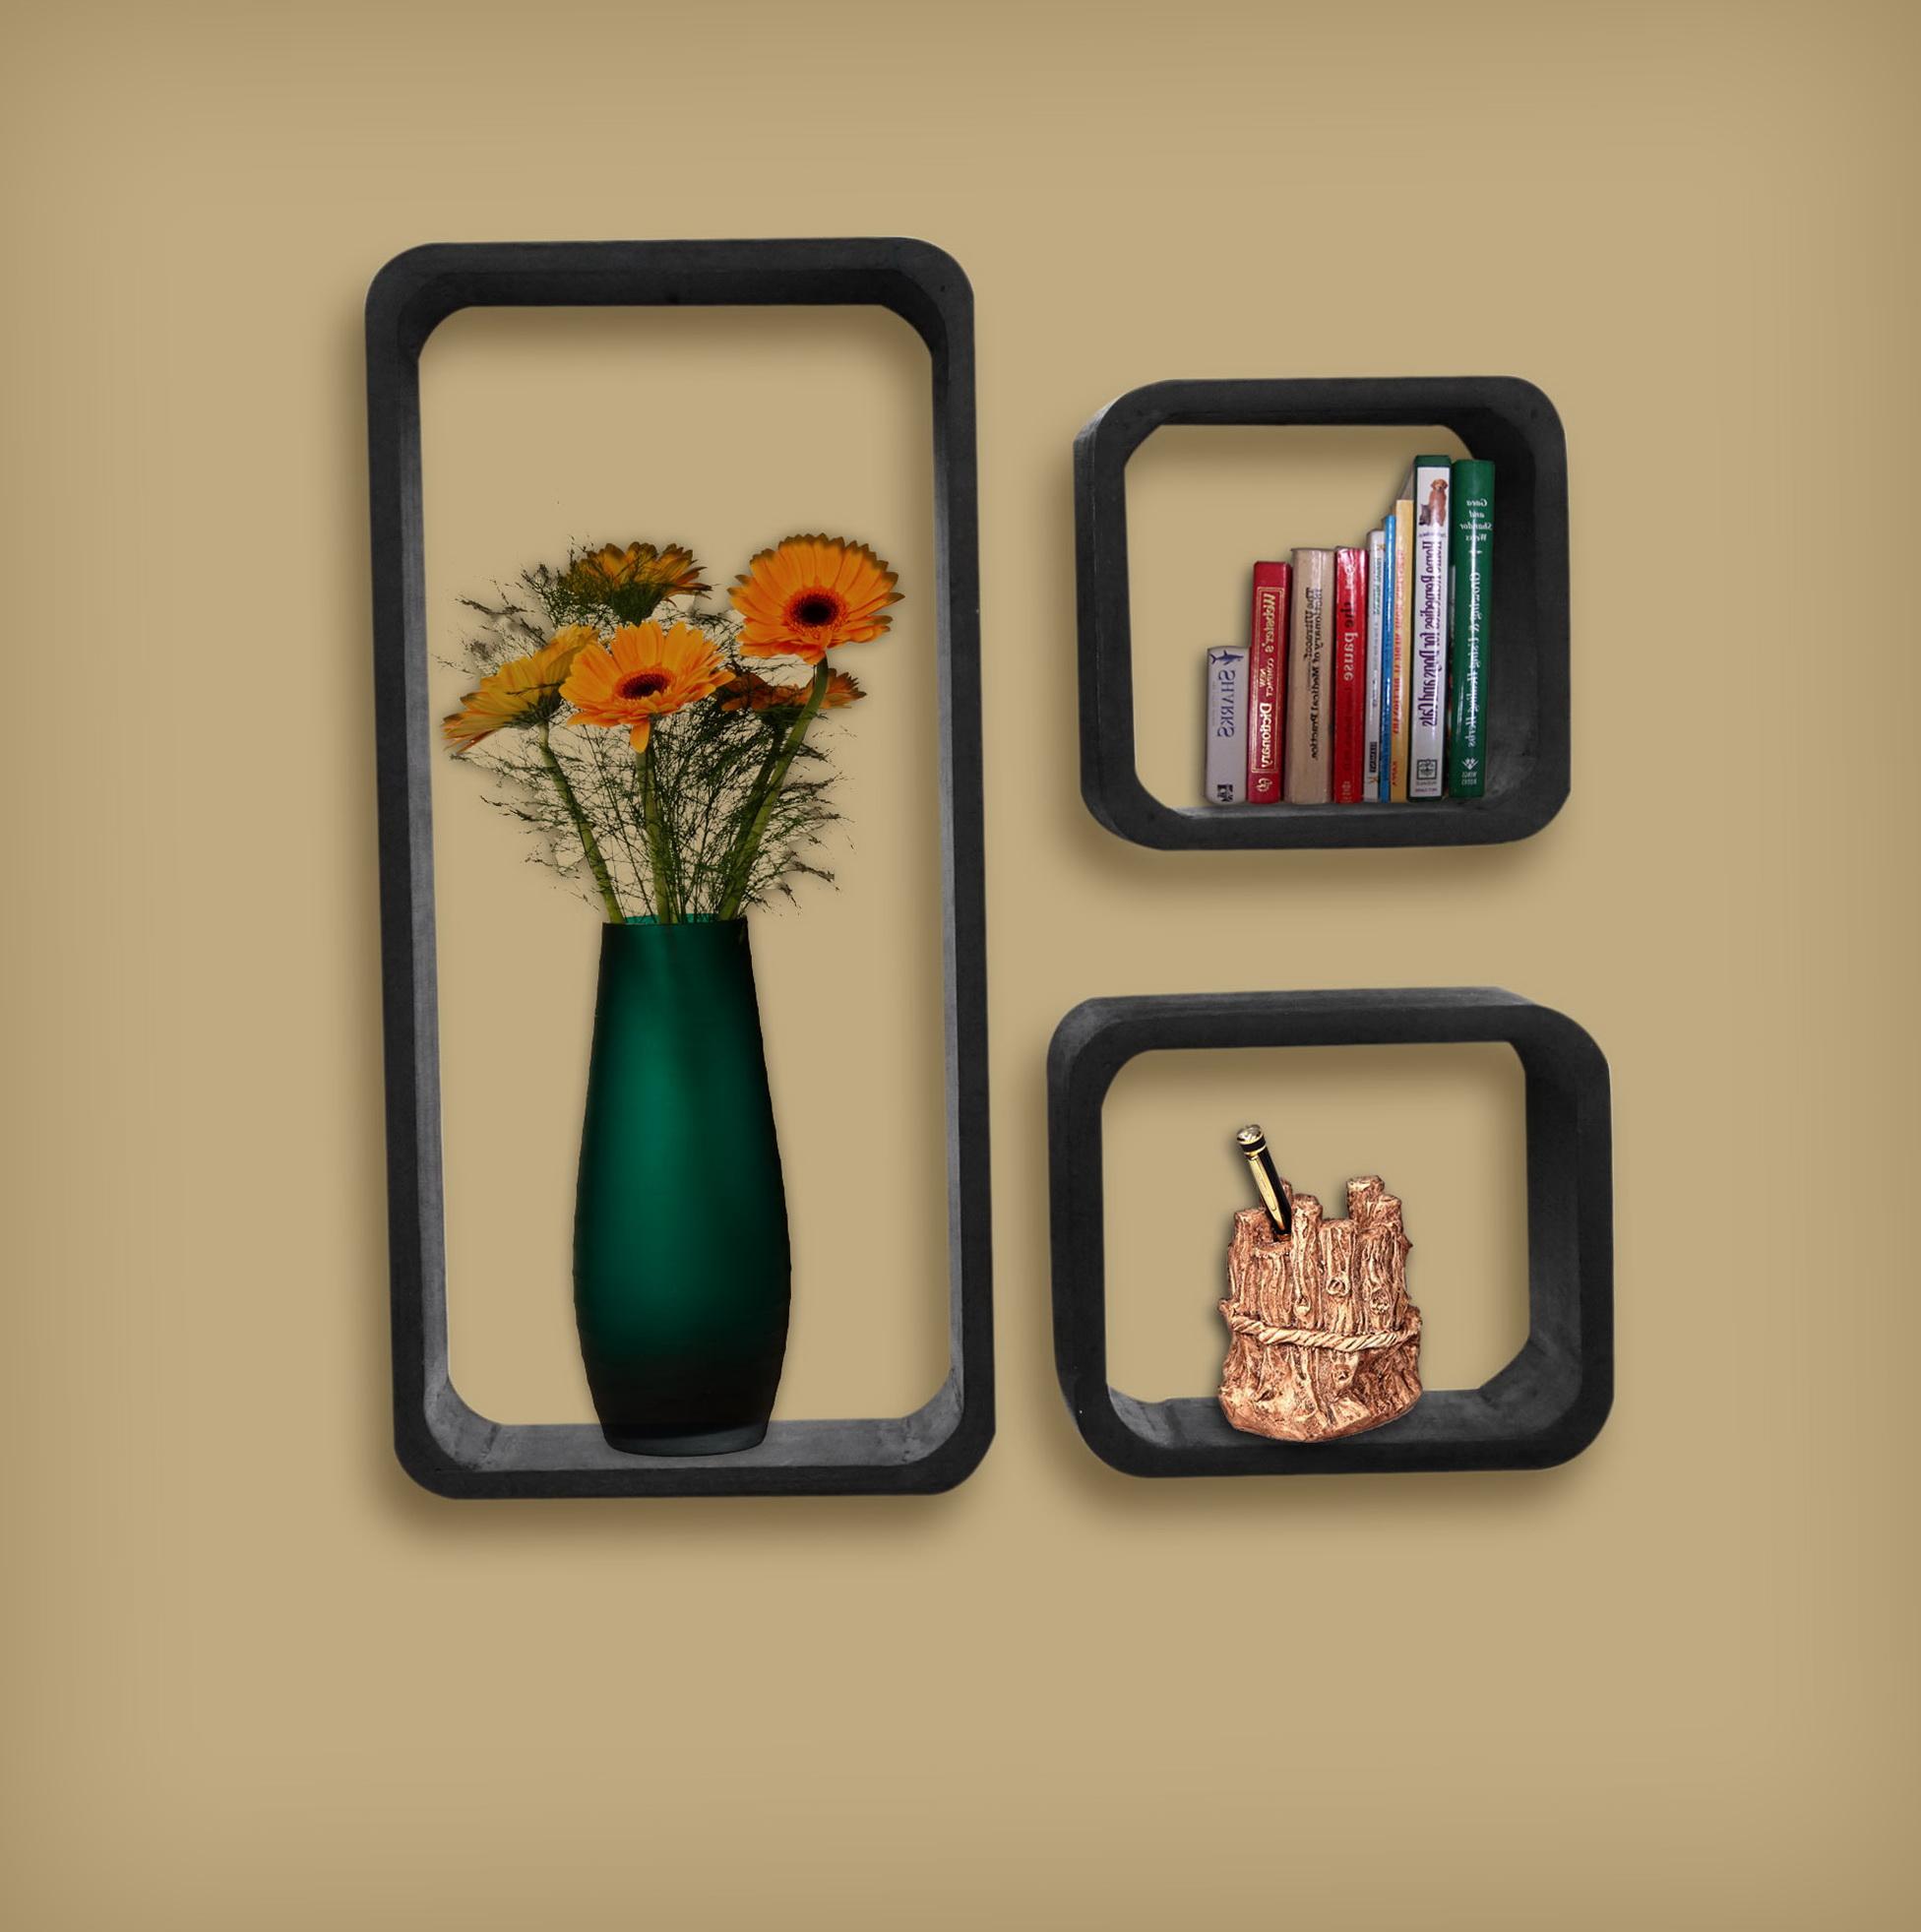 Wall Bookshelf Ideas | Home Design Ideas